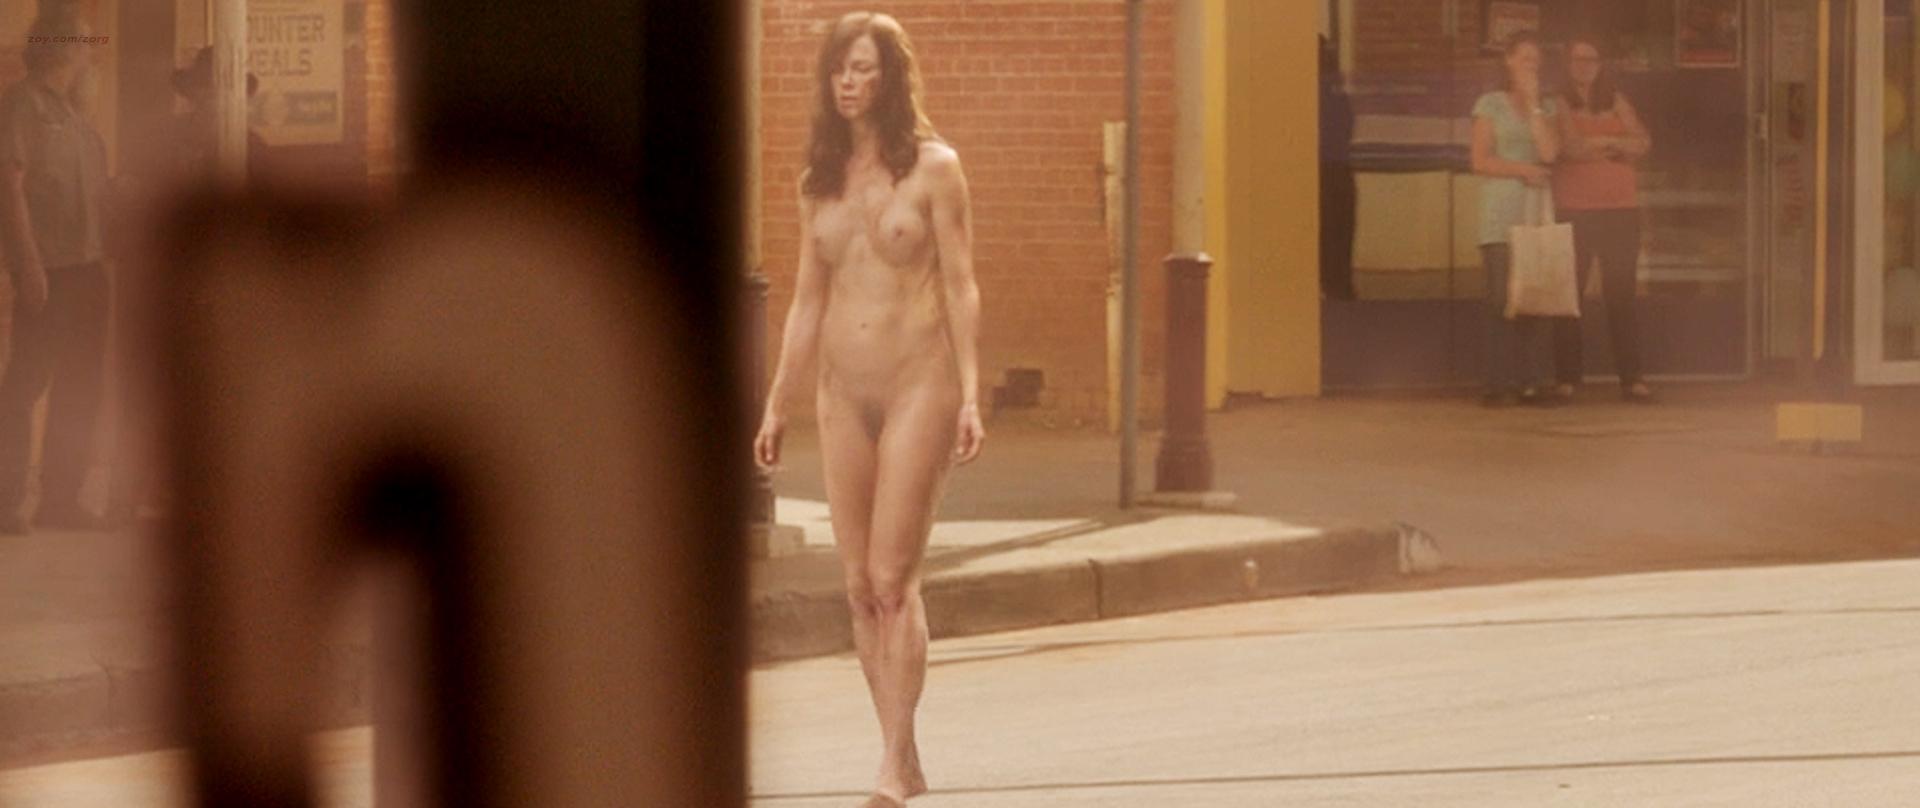 Nicole Kidman nude full frontal or bd and Madisson Brown hot - Strangerland (2015) hd1080p BluRay (15)